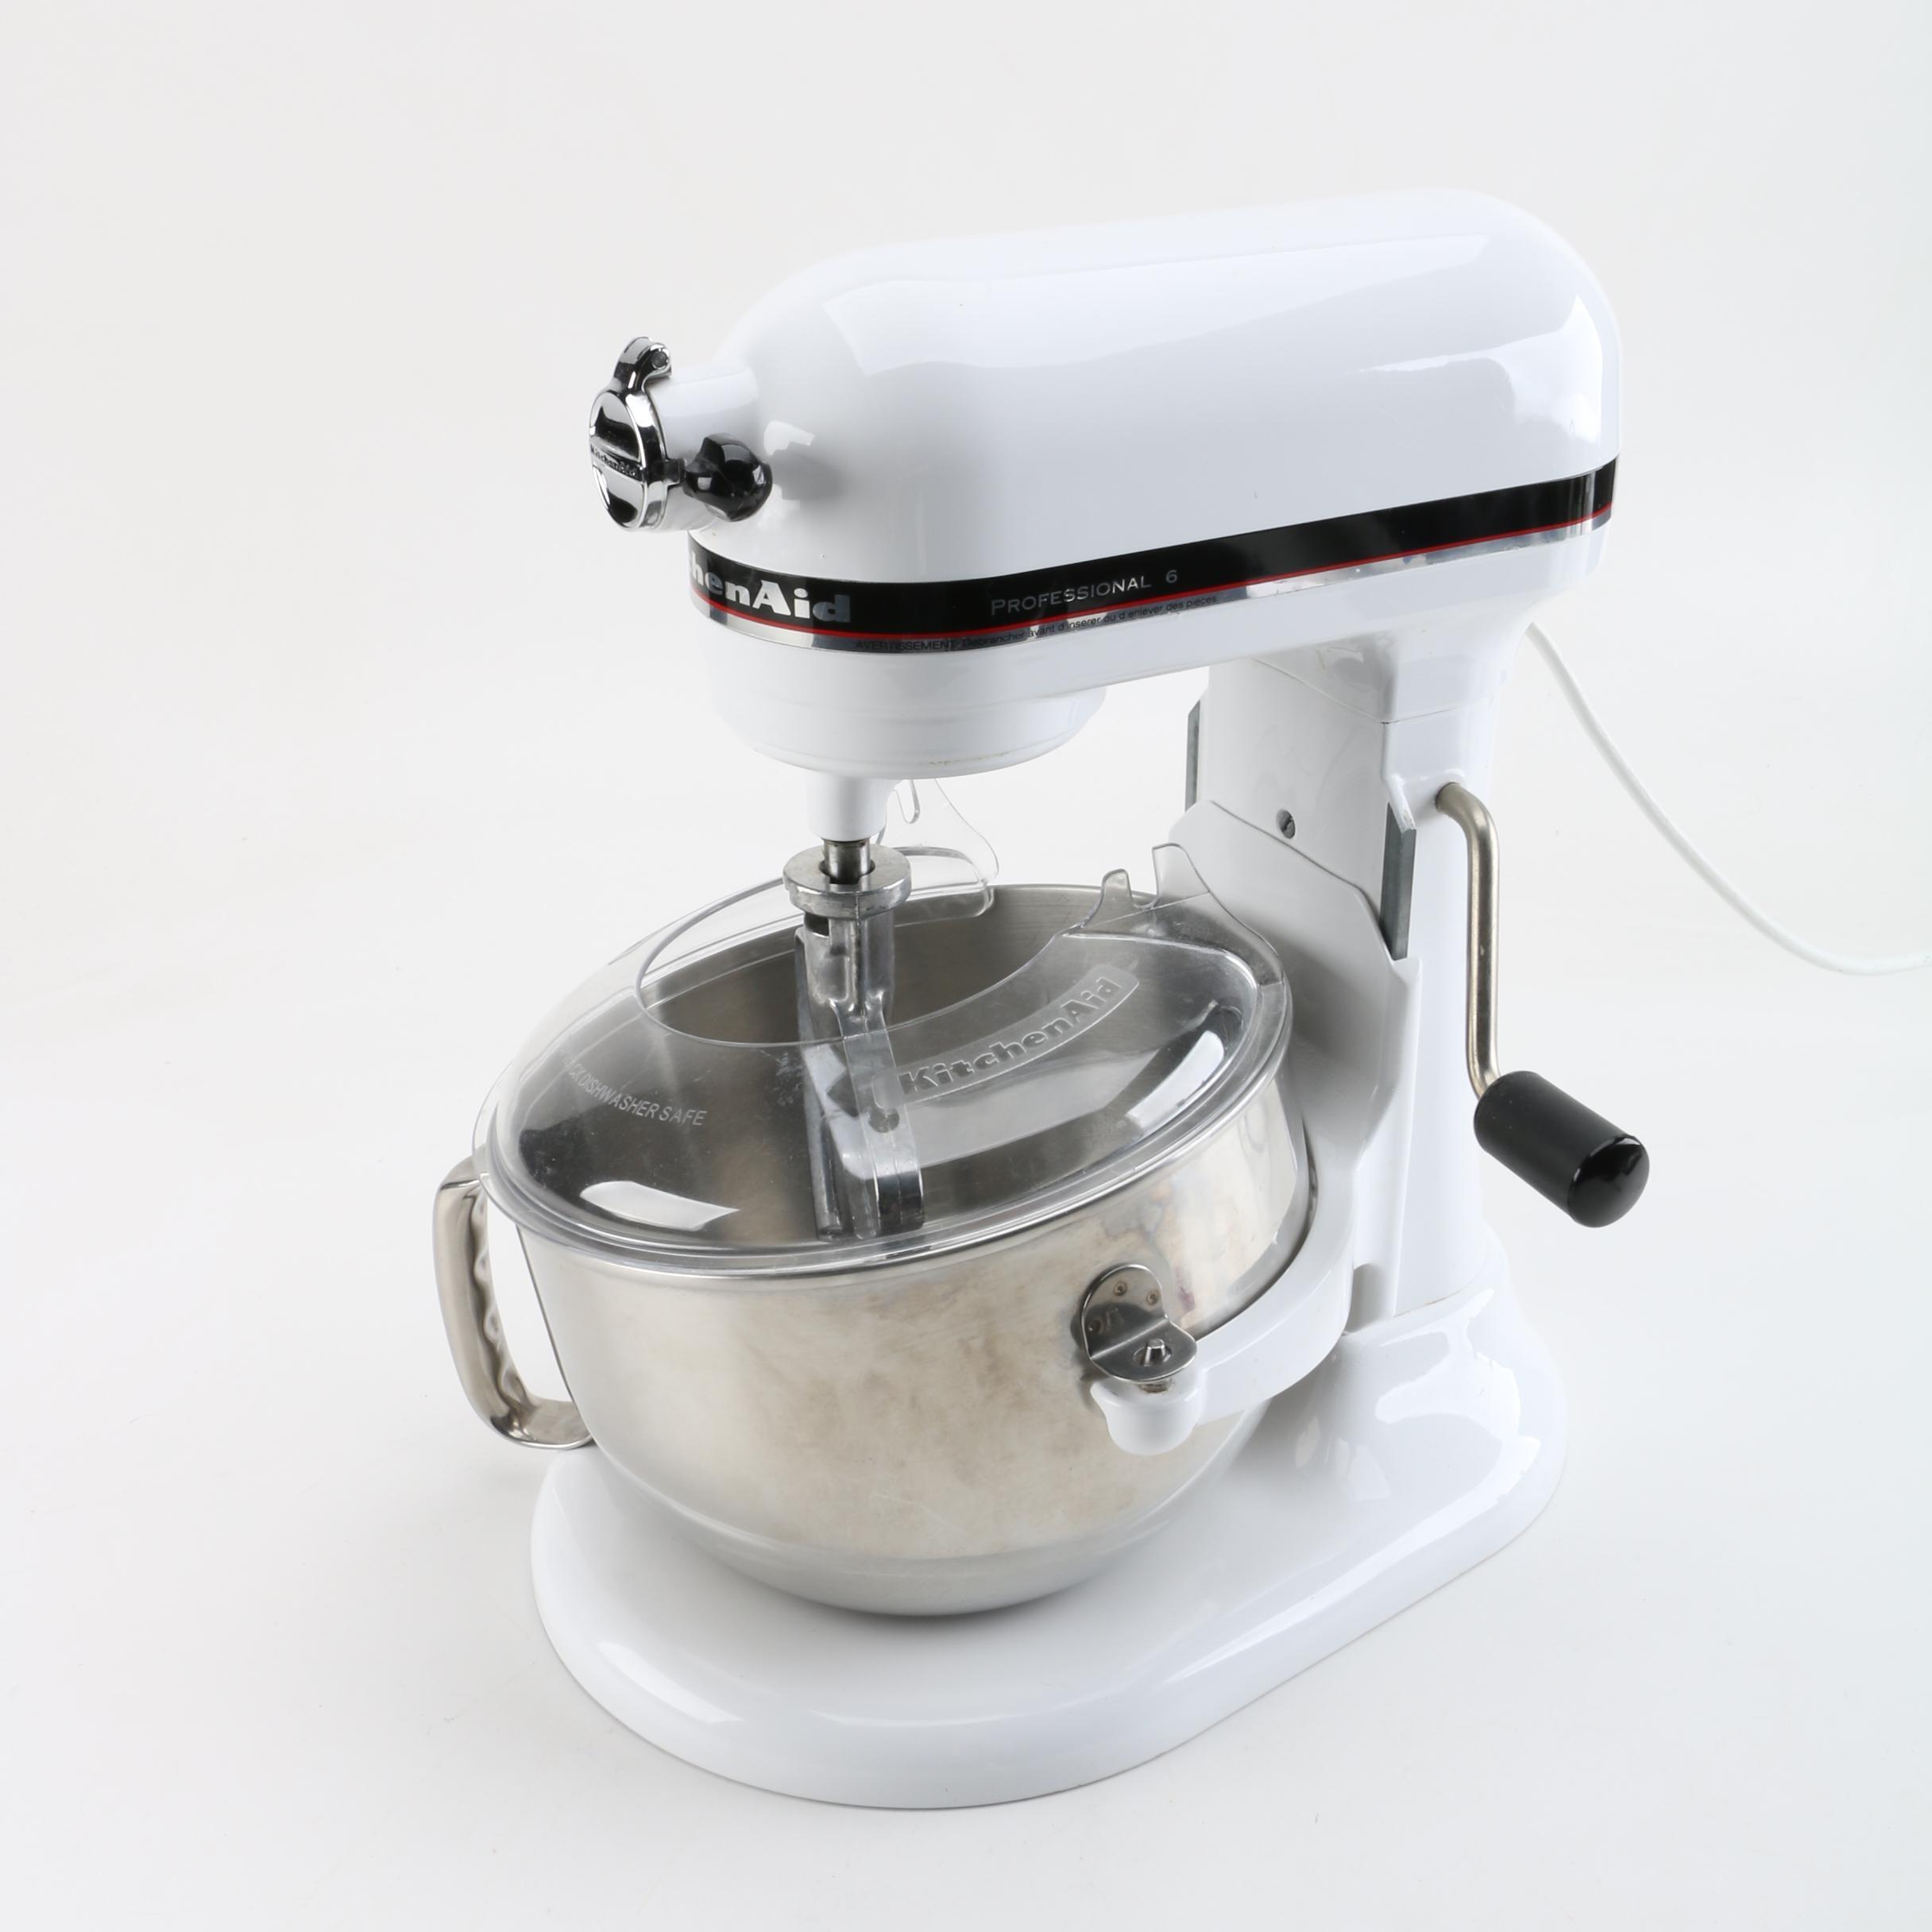 KitchenAid Professional 6 Countertop Mixer